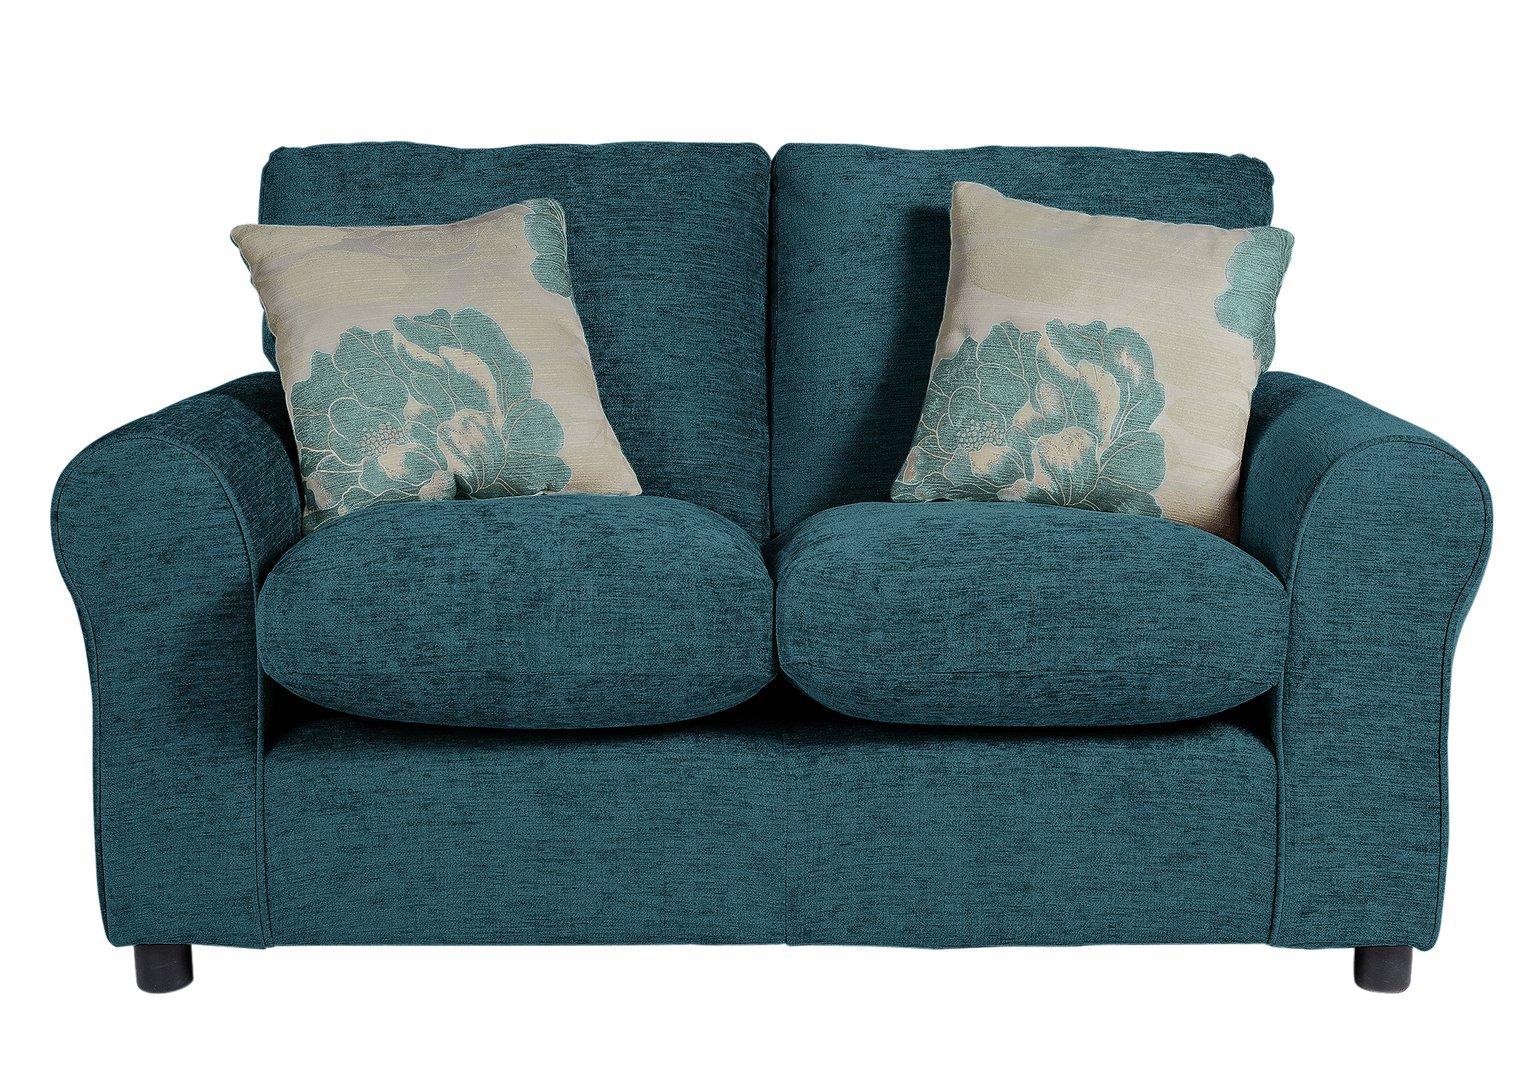 HOME - Tessa Compact 2 Seater - Fabric Sofa - Teal